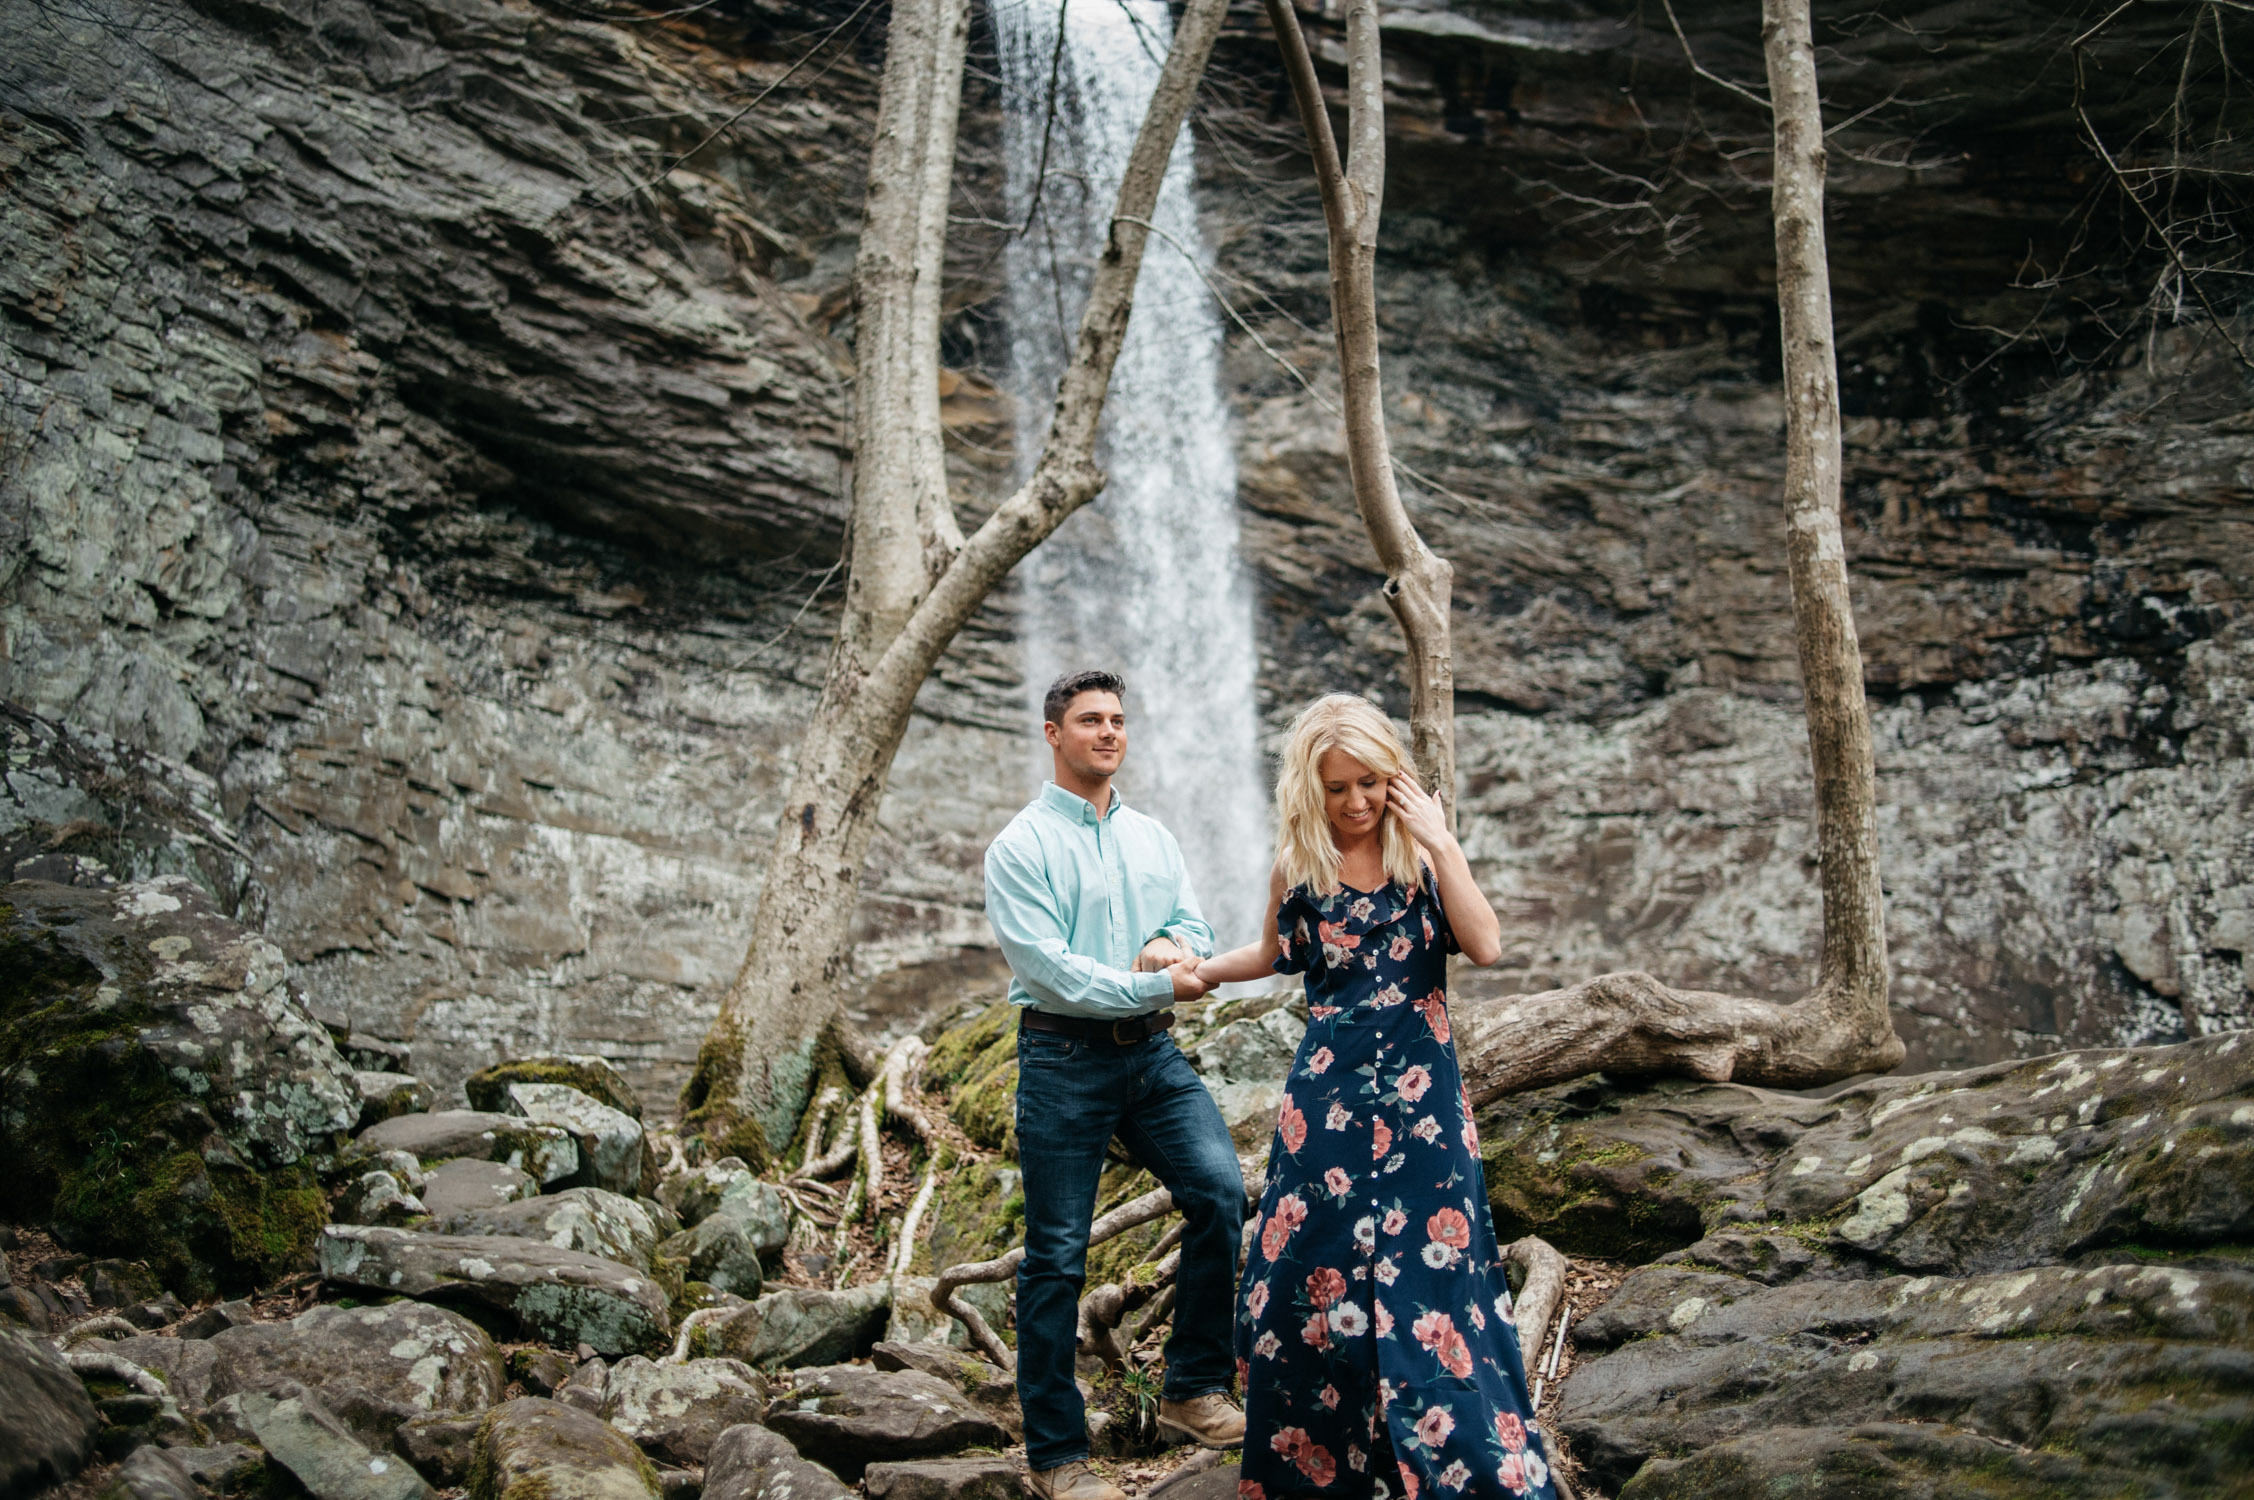 Tennessee Waterfall Engagement by Tara Kneiser